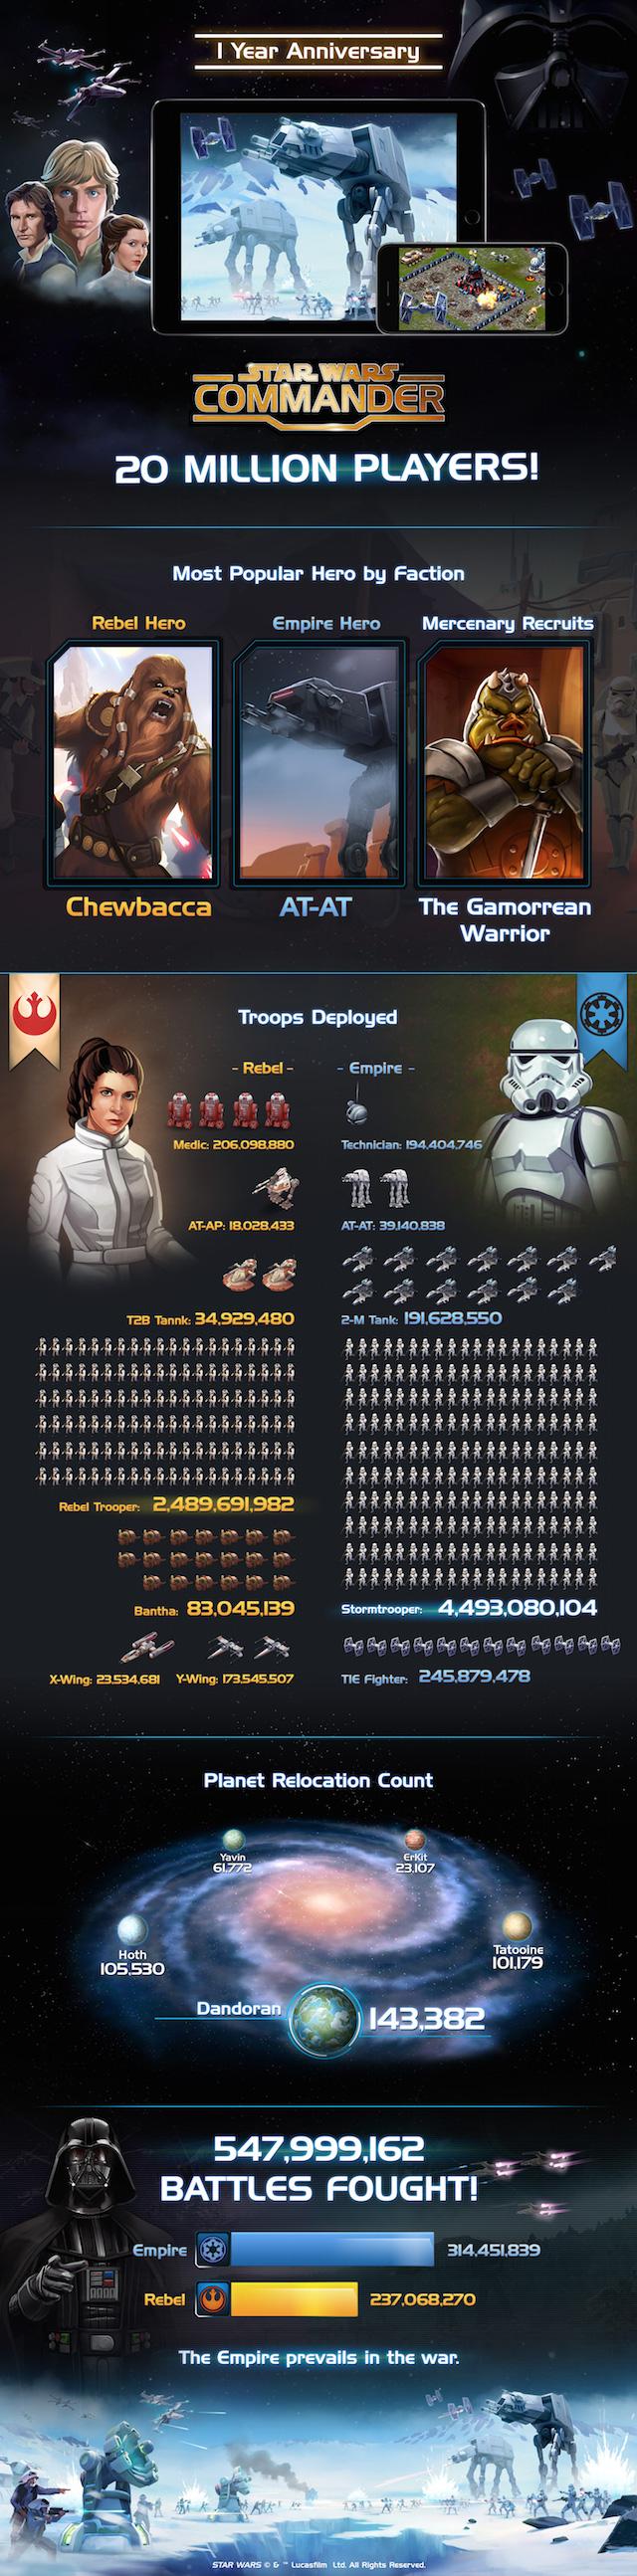 Star-Wars-Commander-Infographic1